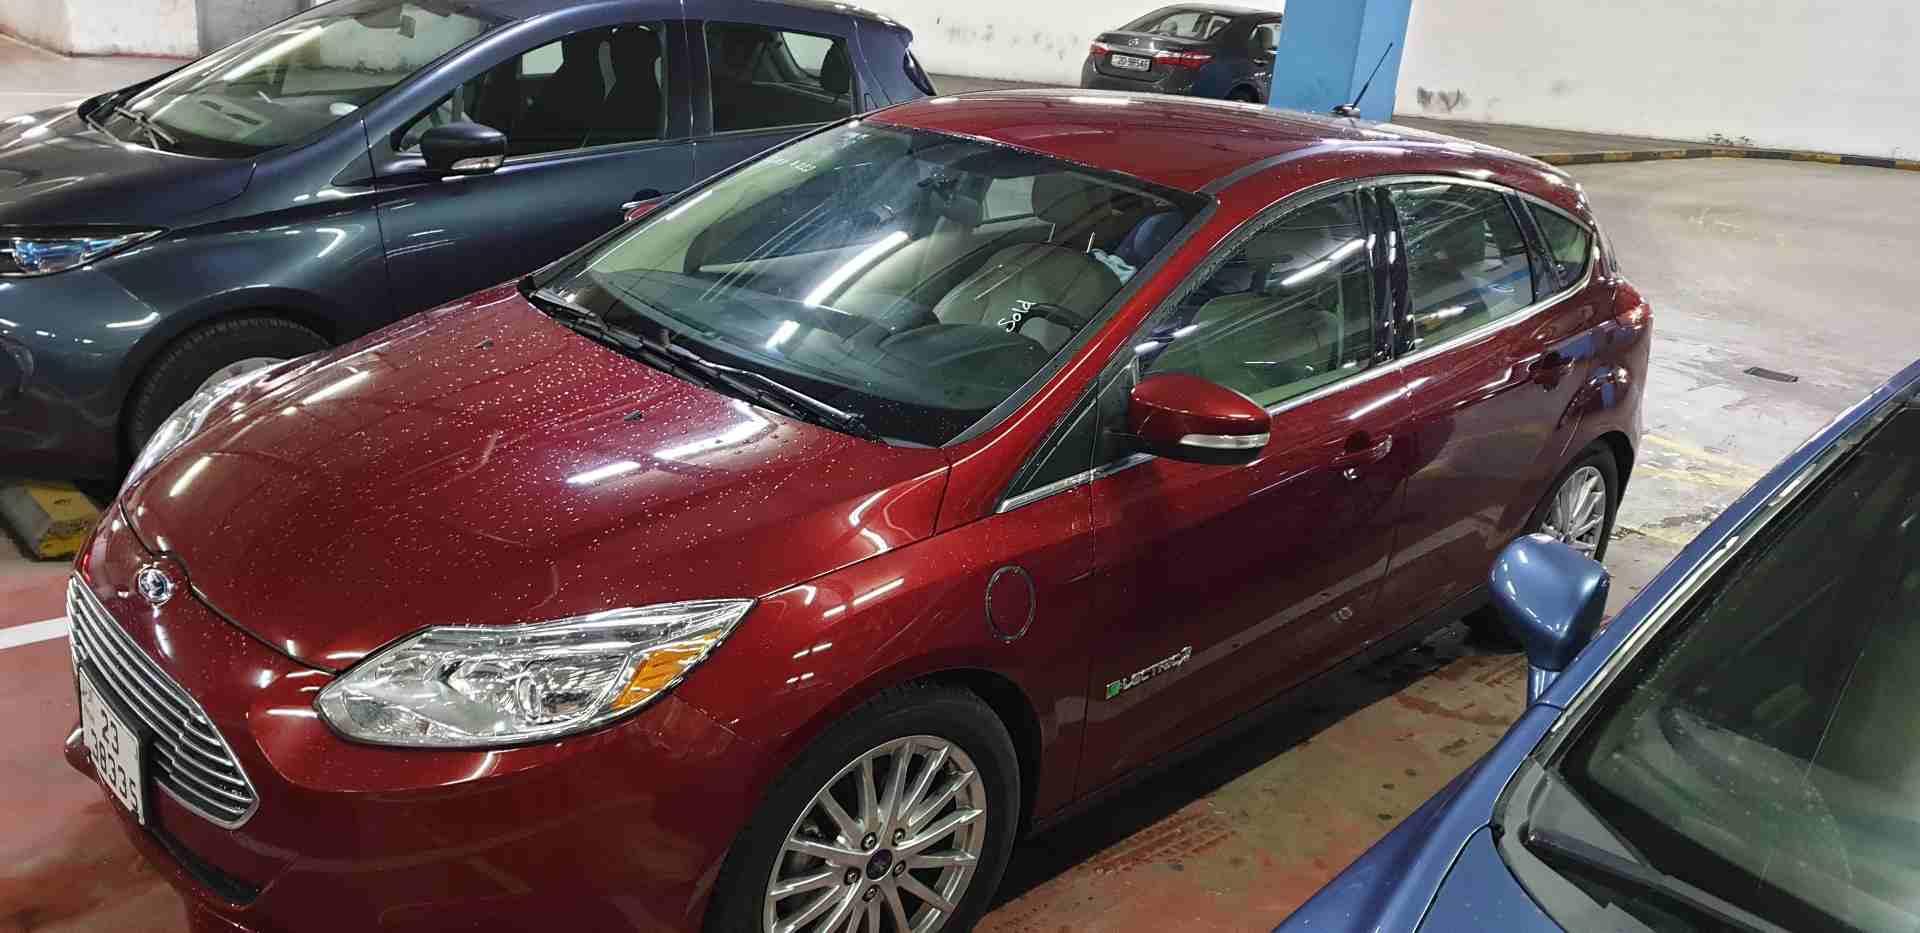 2016 Nissan patrol le platinum-  فورد فوكس لون خمري مميز...